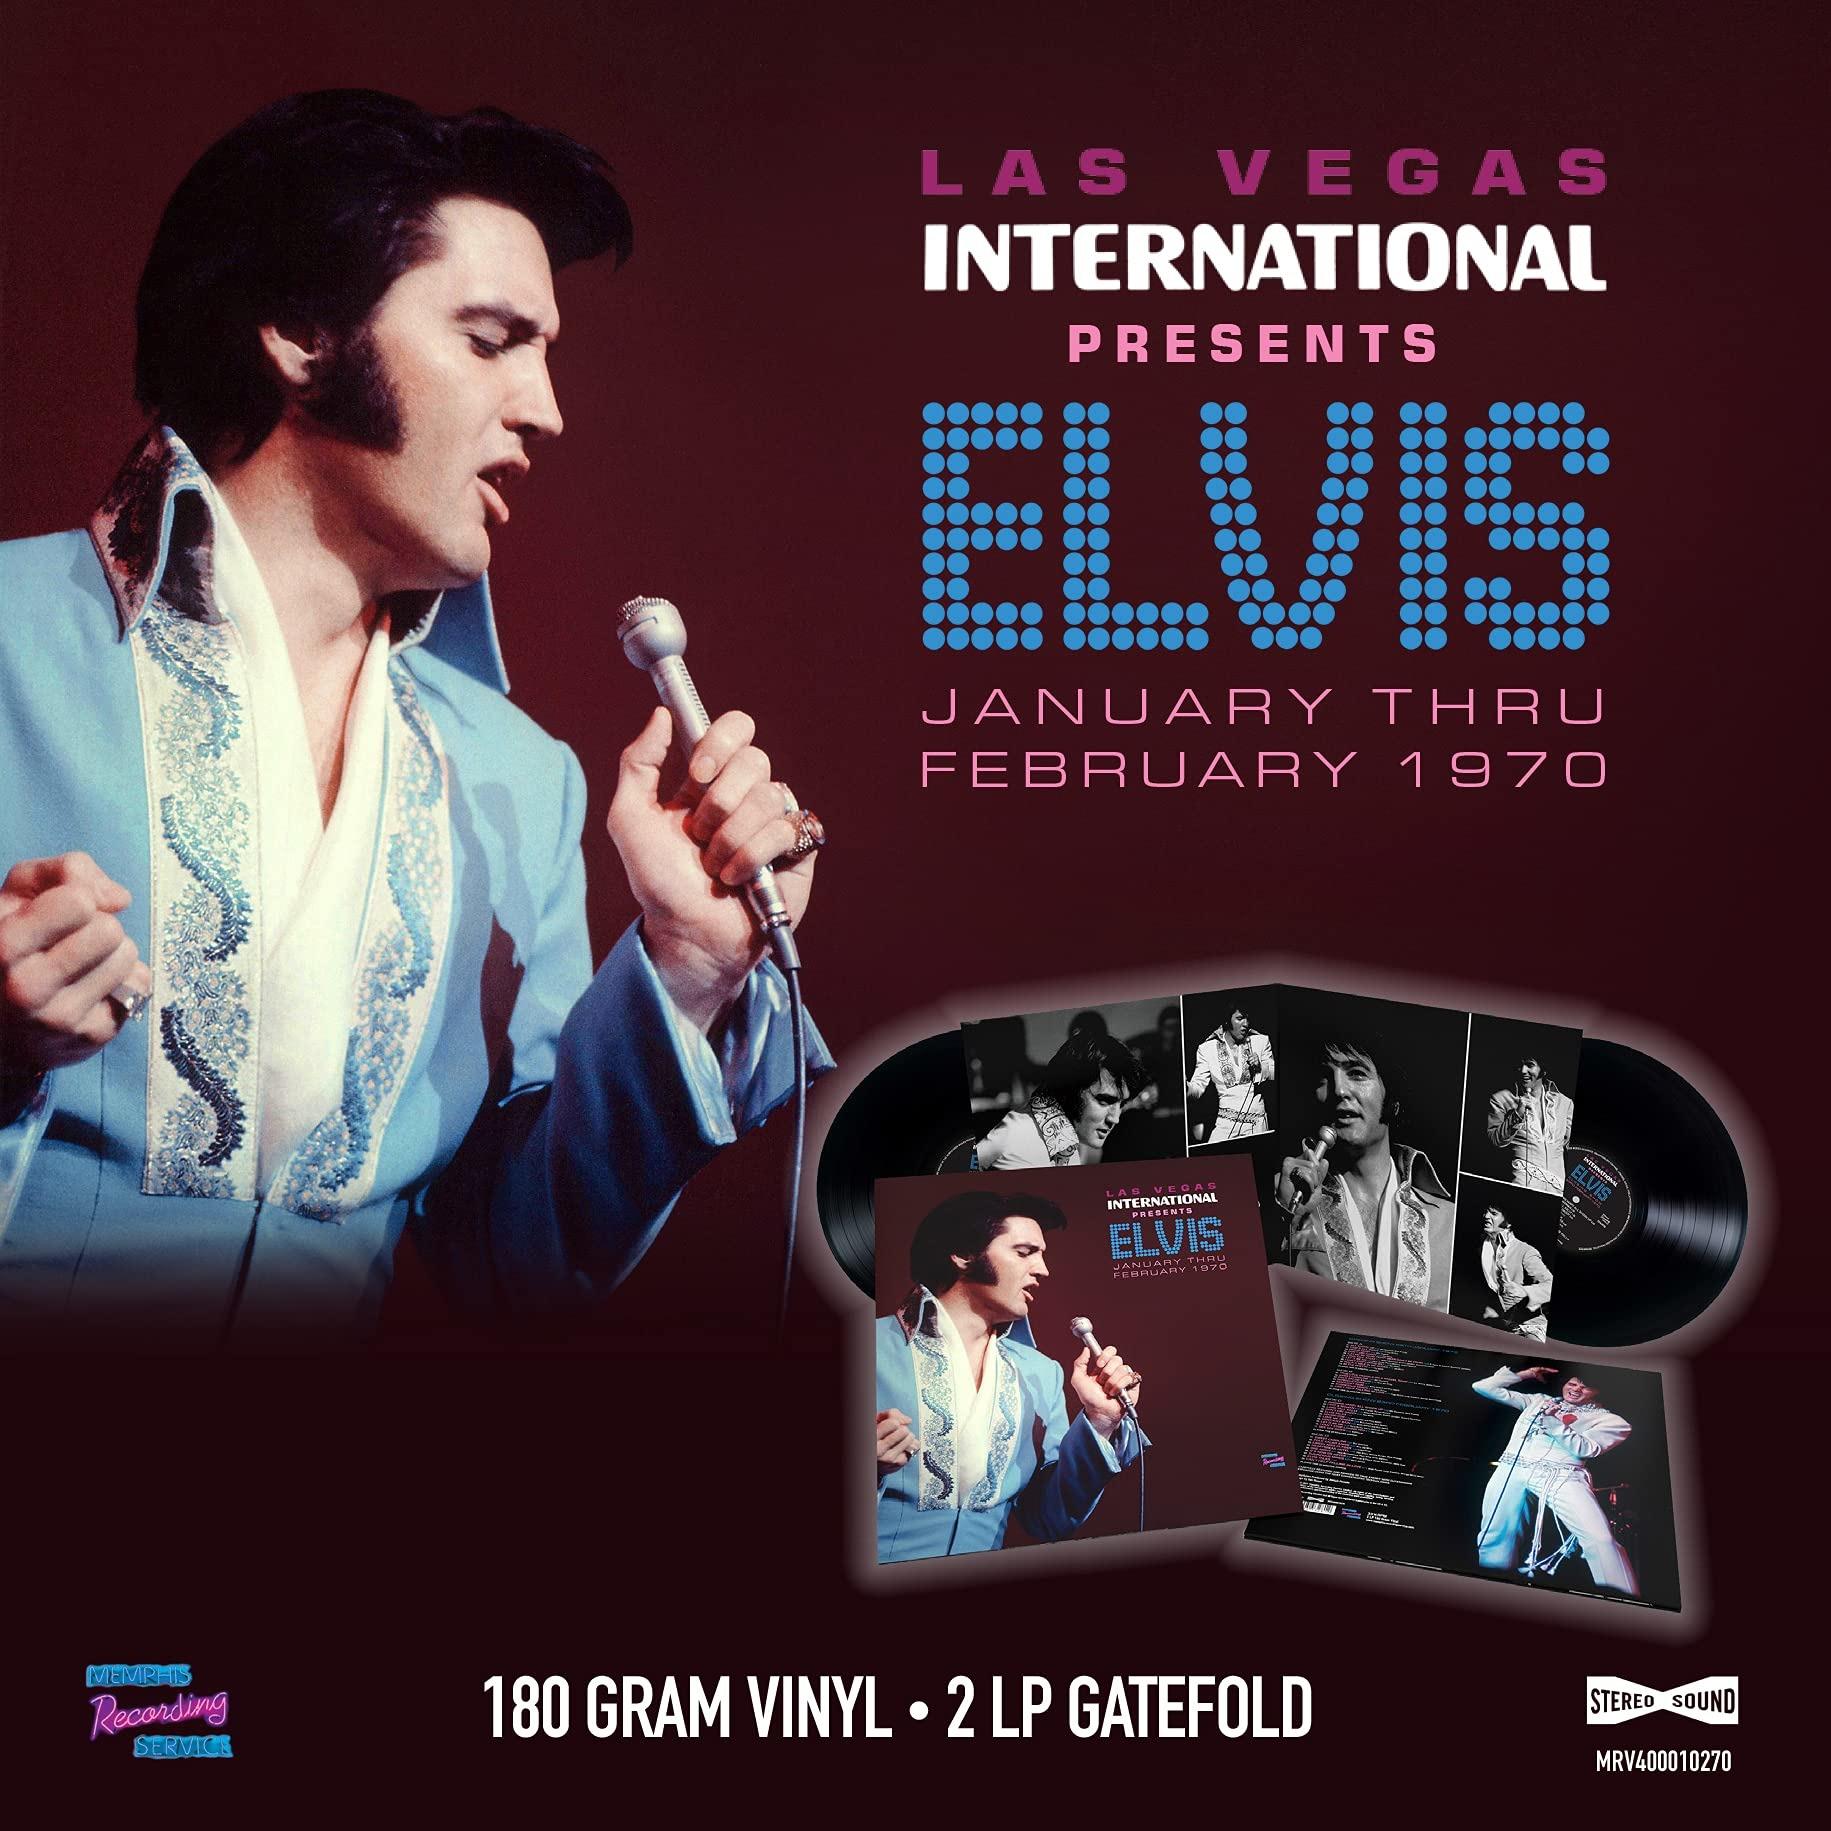 Las Vegas International Presents Elvis - January Thru February 1970 - Elvis Presley - Musik - MEMPHIS - 5024545932812 - June 18, 2021